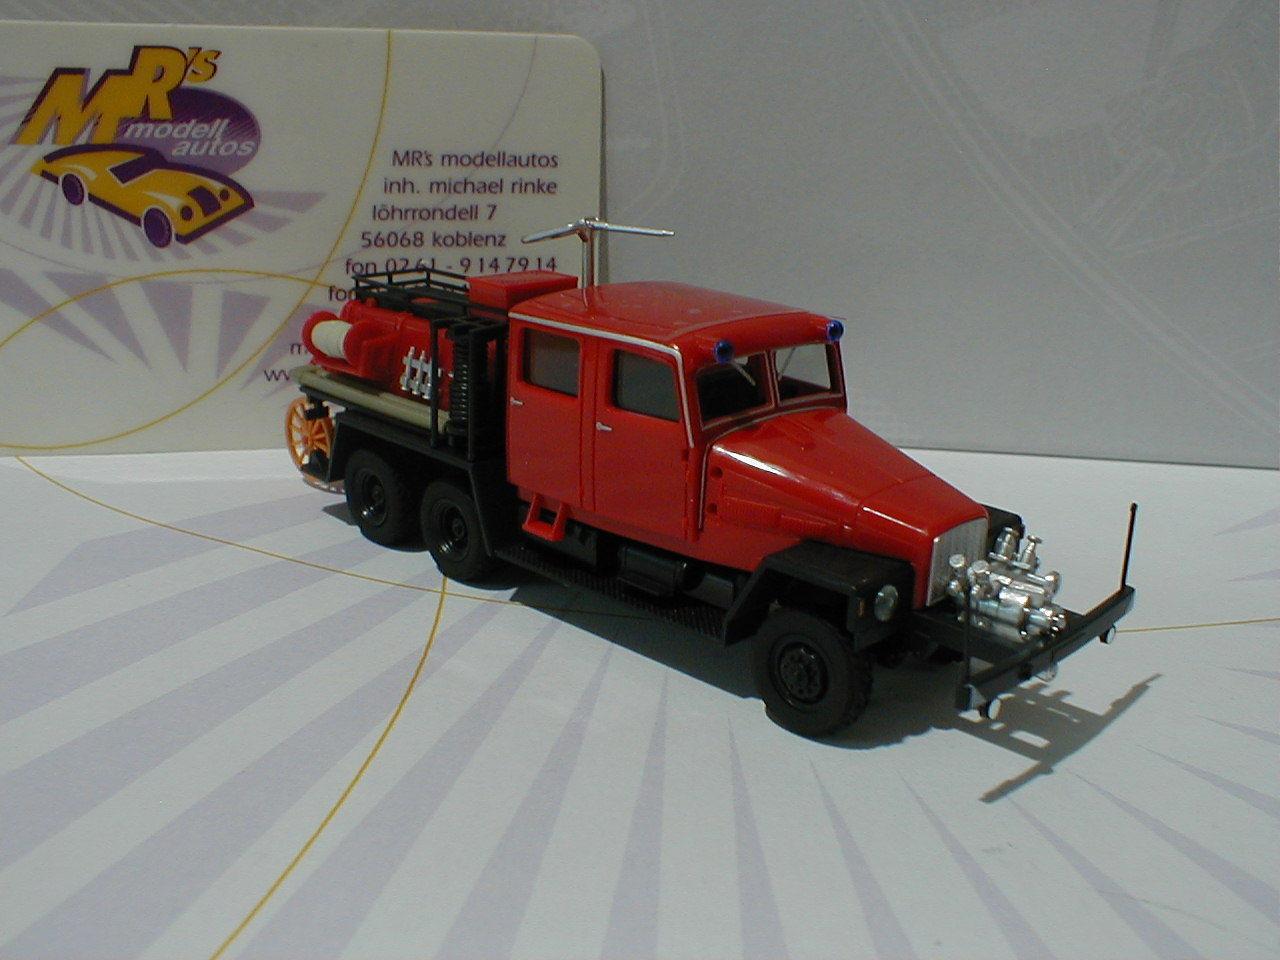 HERPA 049900-IFA g5 tanklöschfahrzeug  pompiers  1 87 Nouveauté